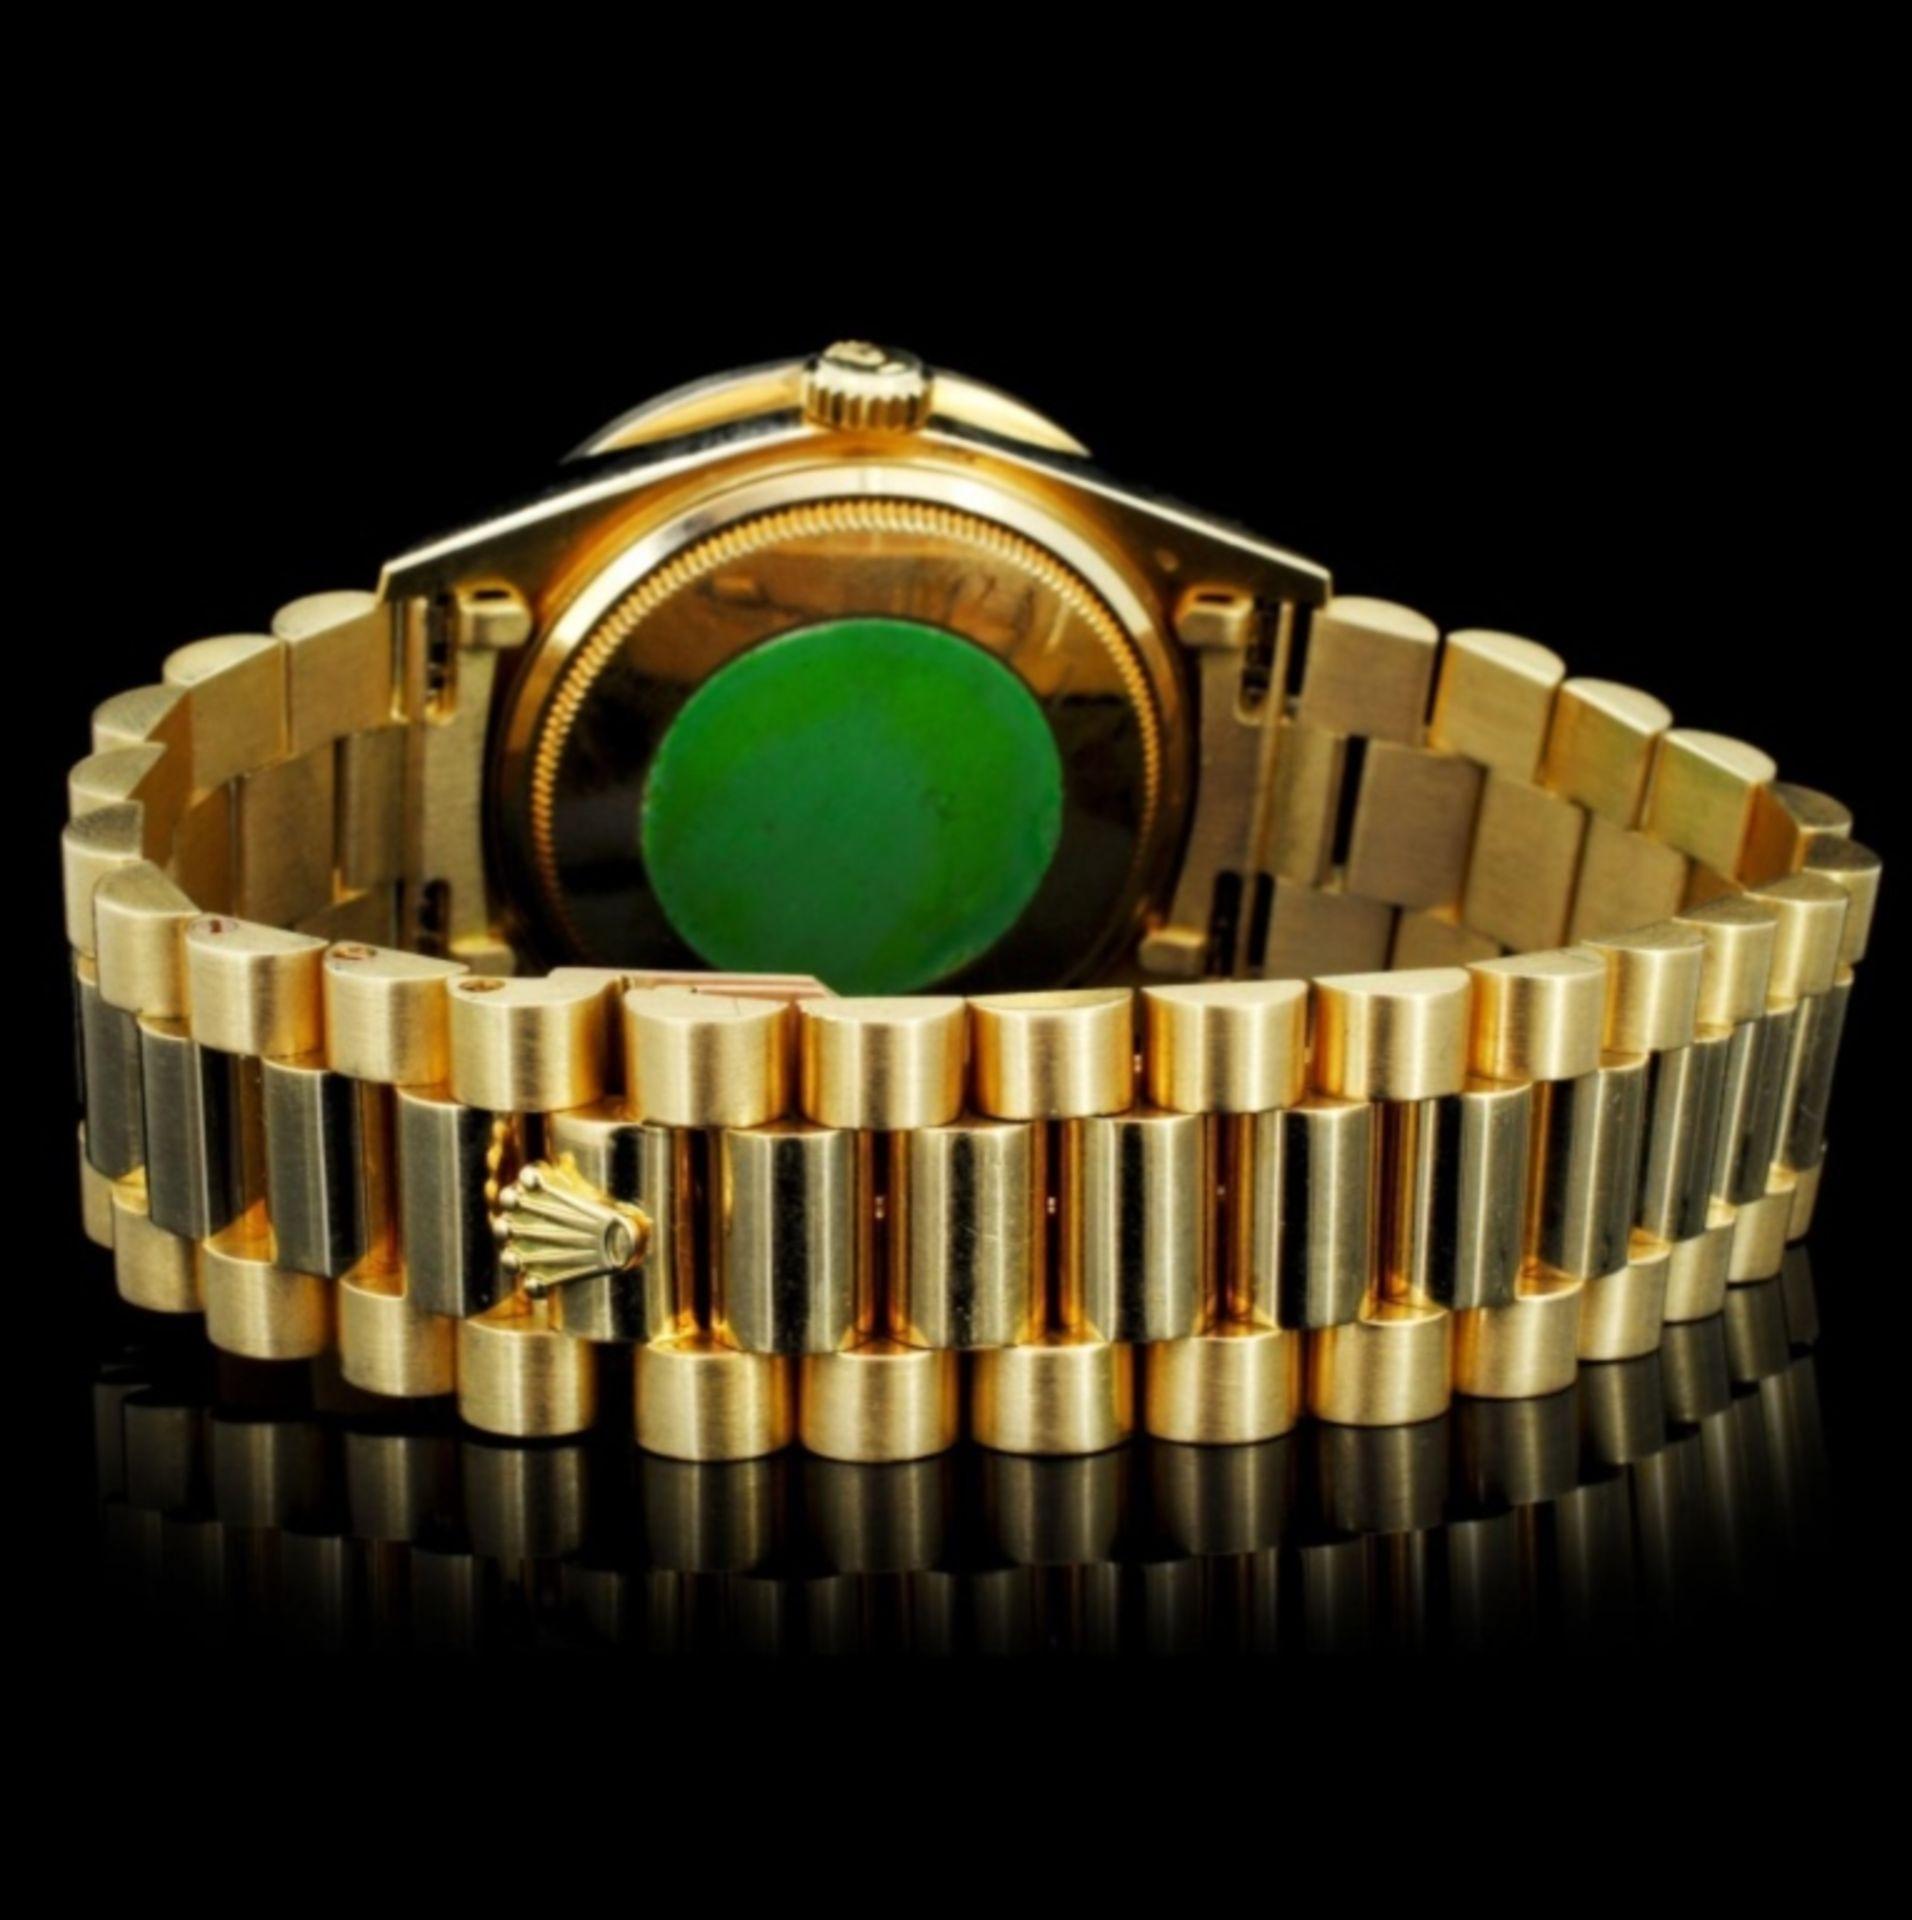 Rolex Day-Date Diamond 36mm Wristwatch - Image 4 of 6